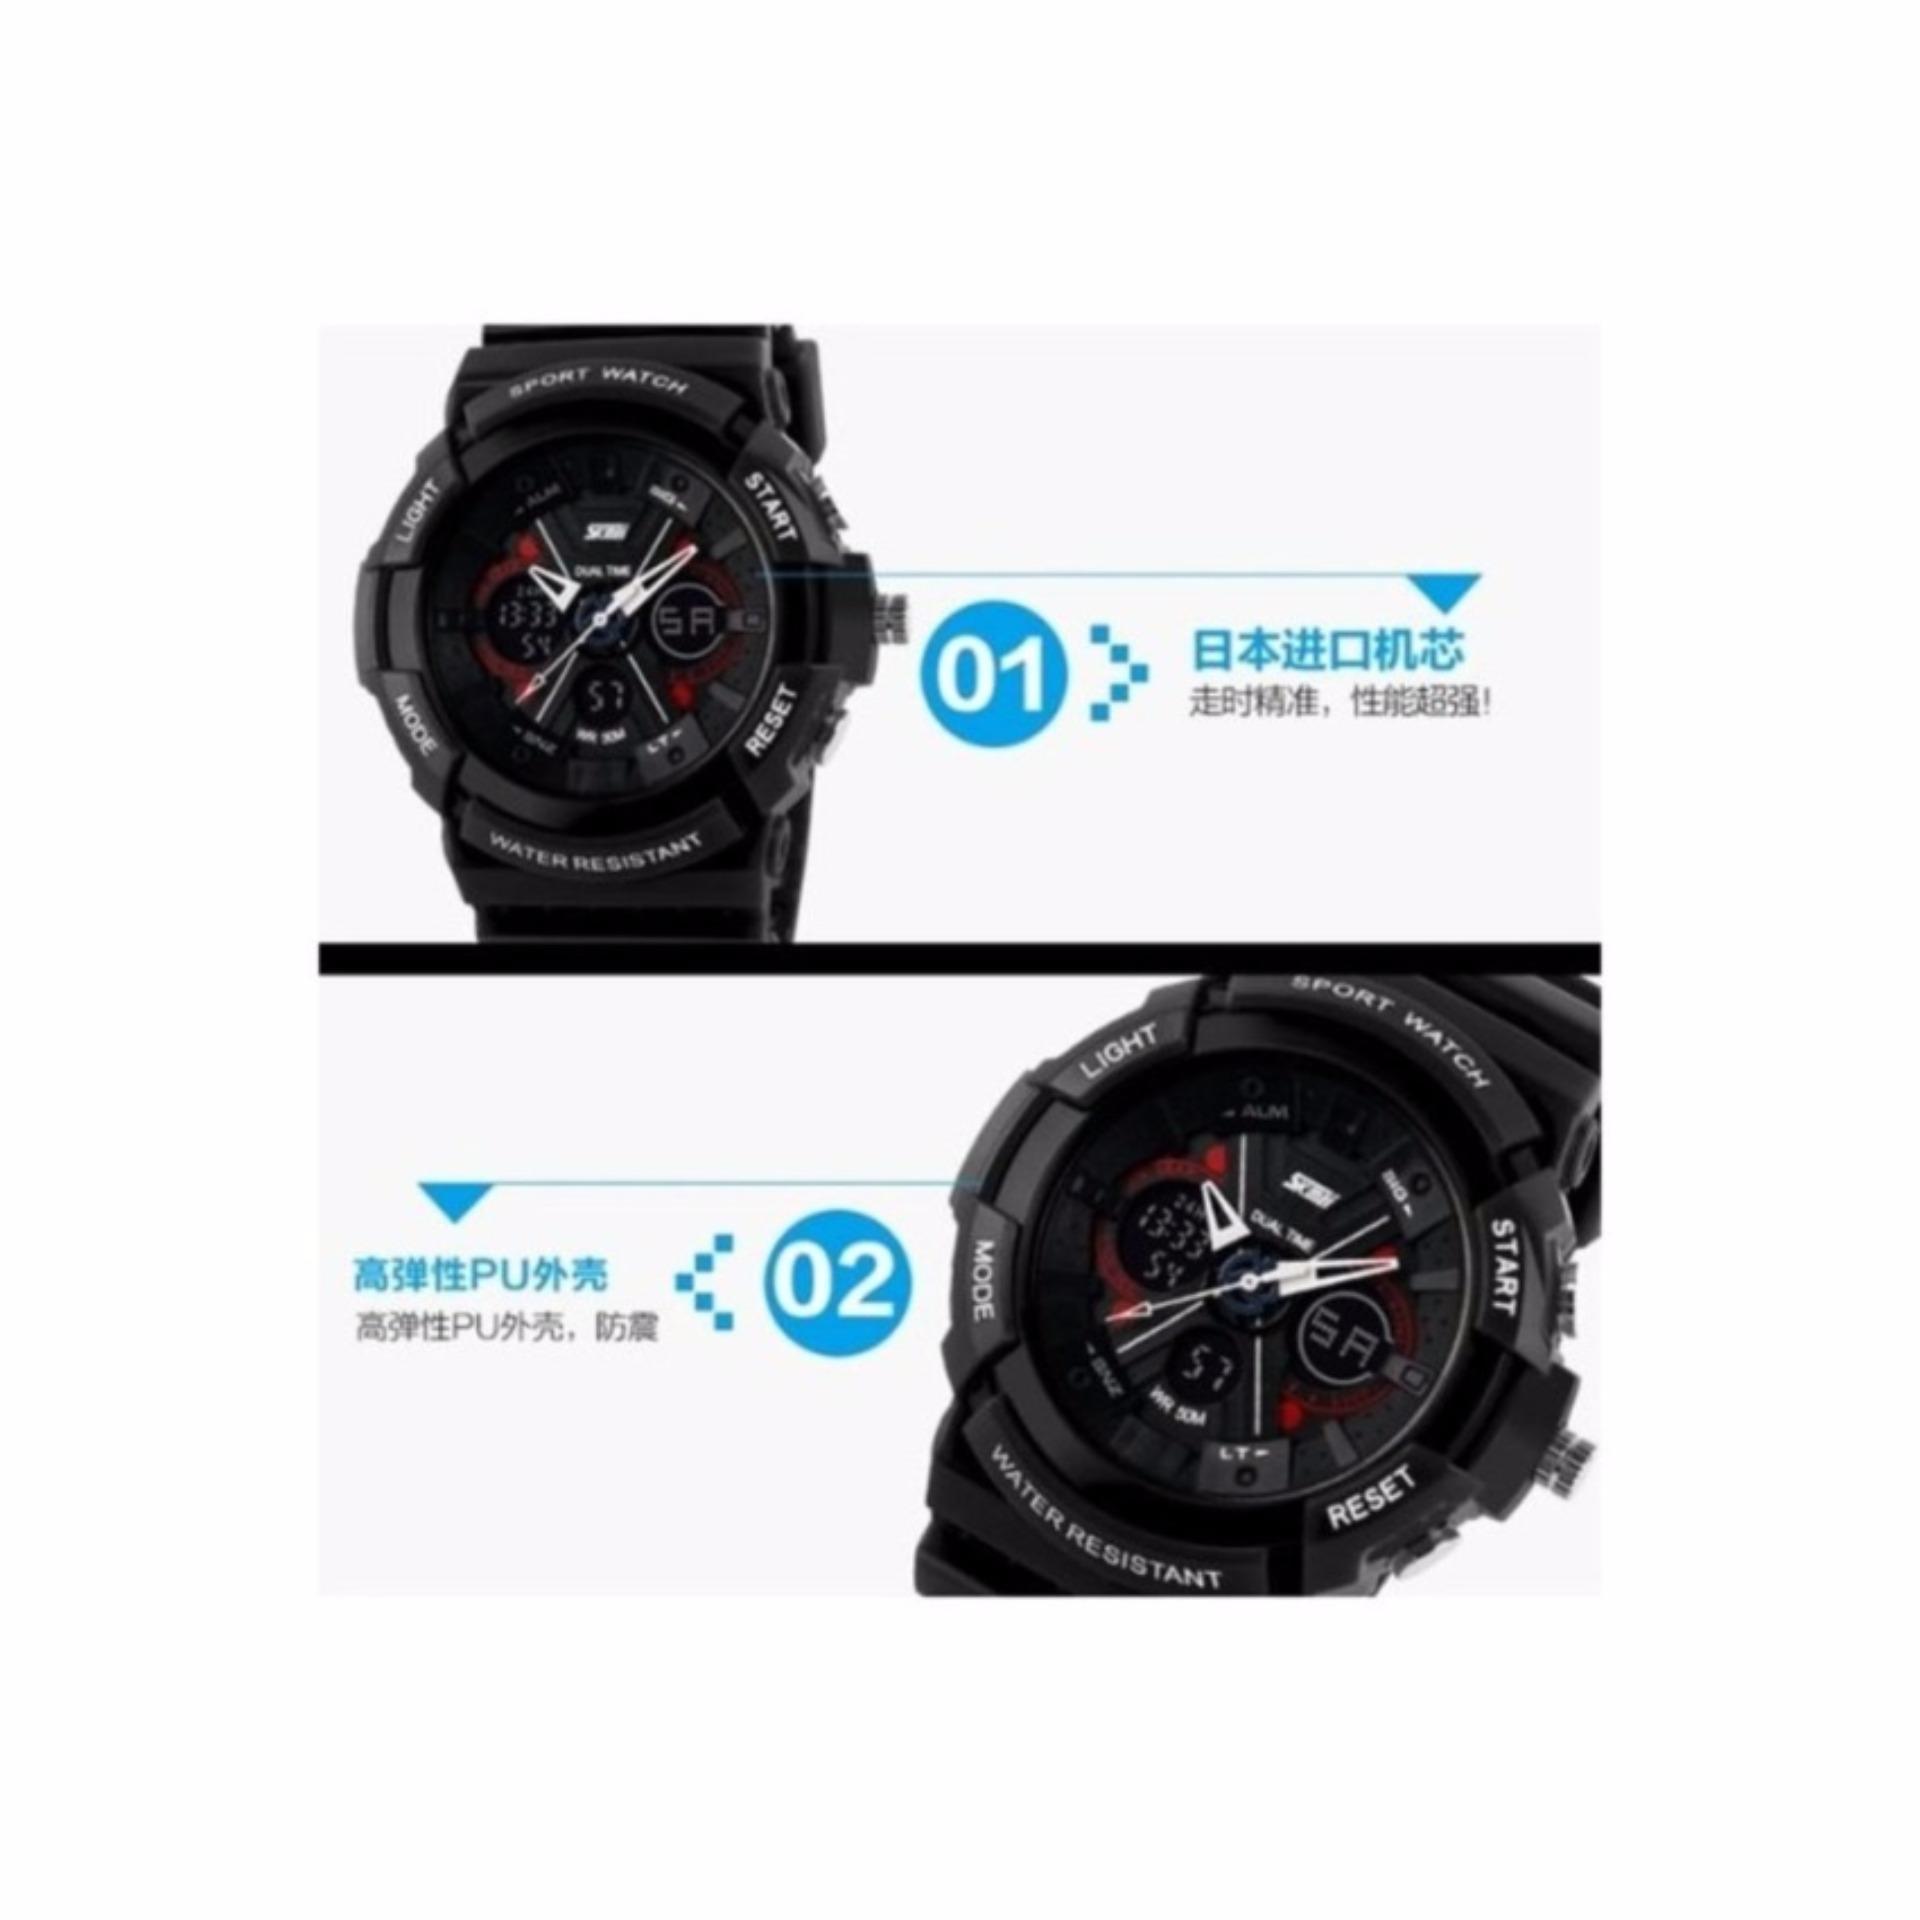 SKMEI Super X Digital LED Sport Watch AD0966 Water Resistant Anti Air WR 50m Jam Tangan